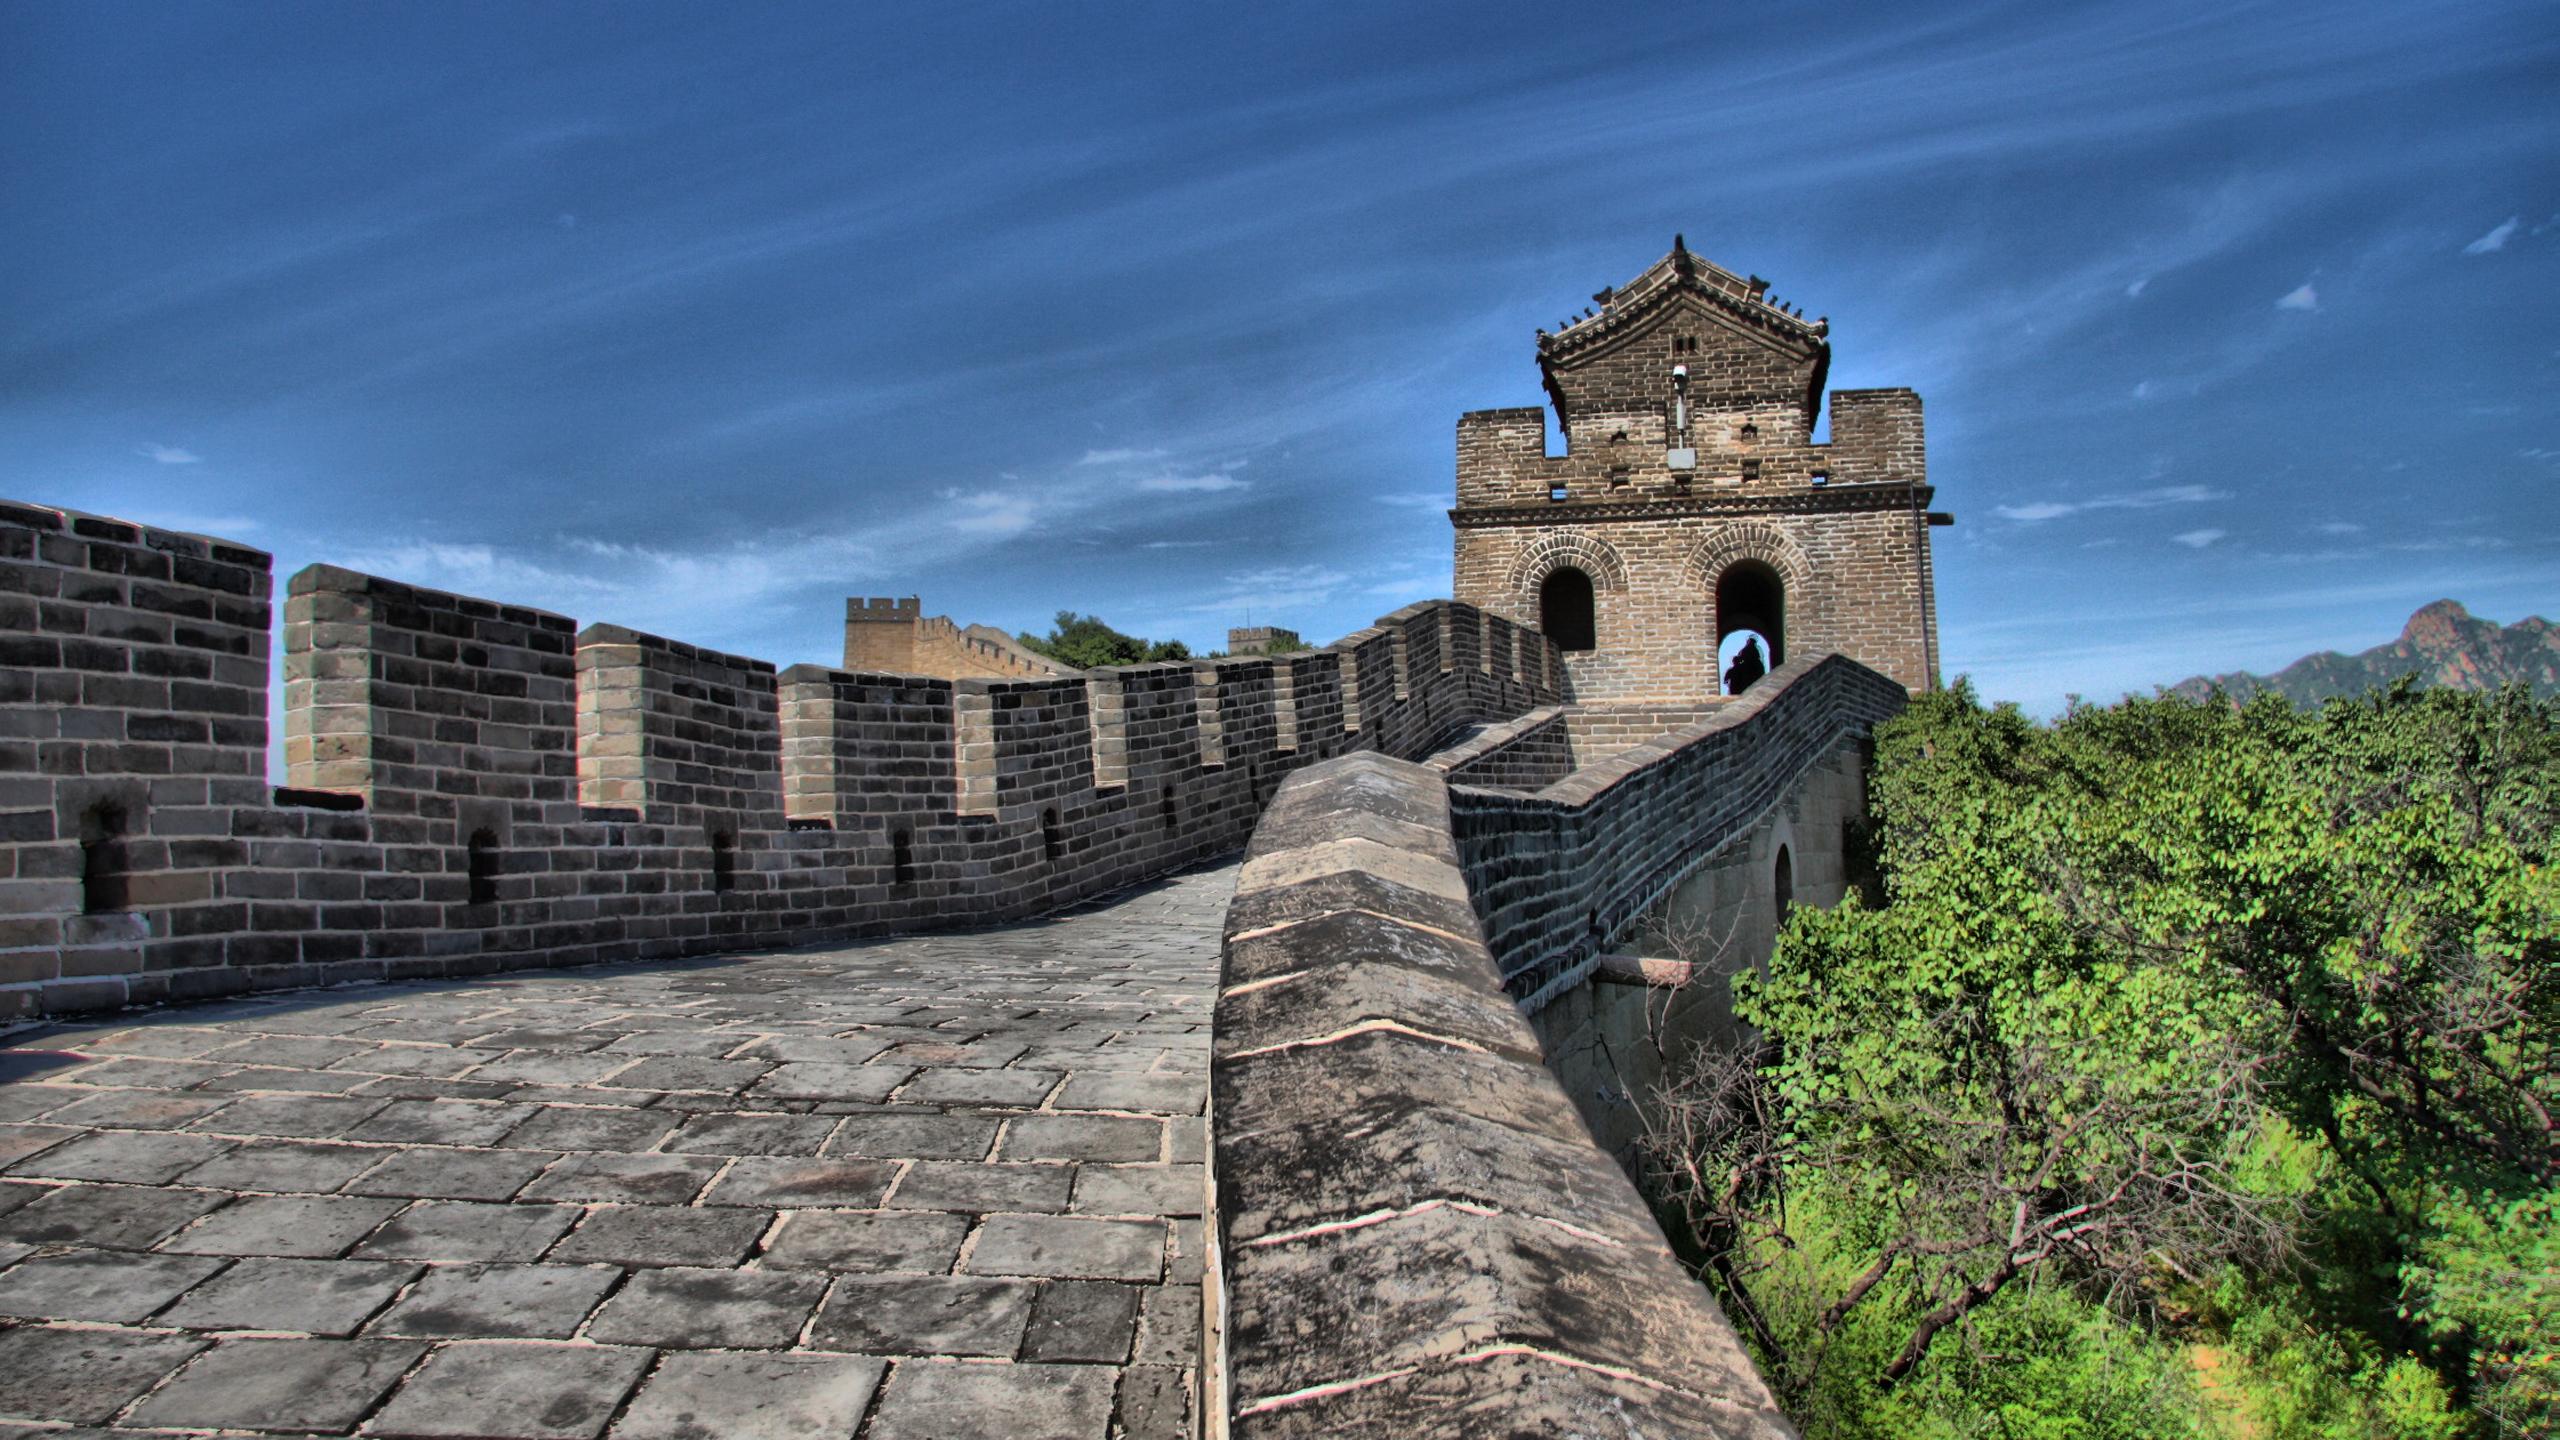 kineski zid mapa sa meseca